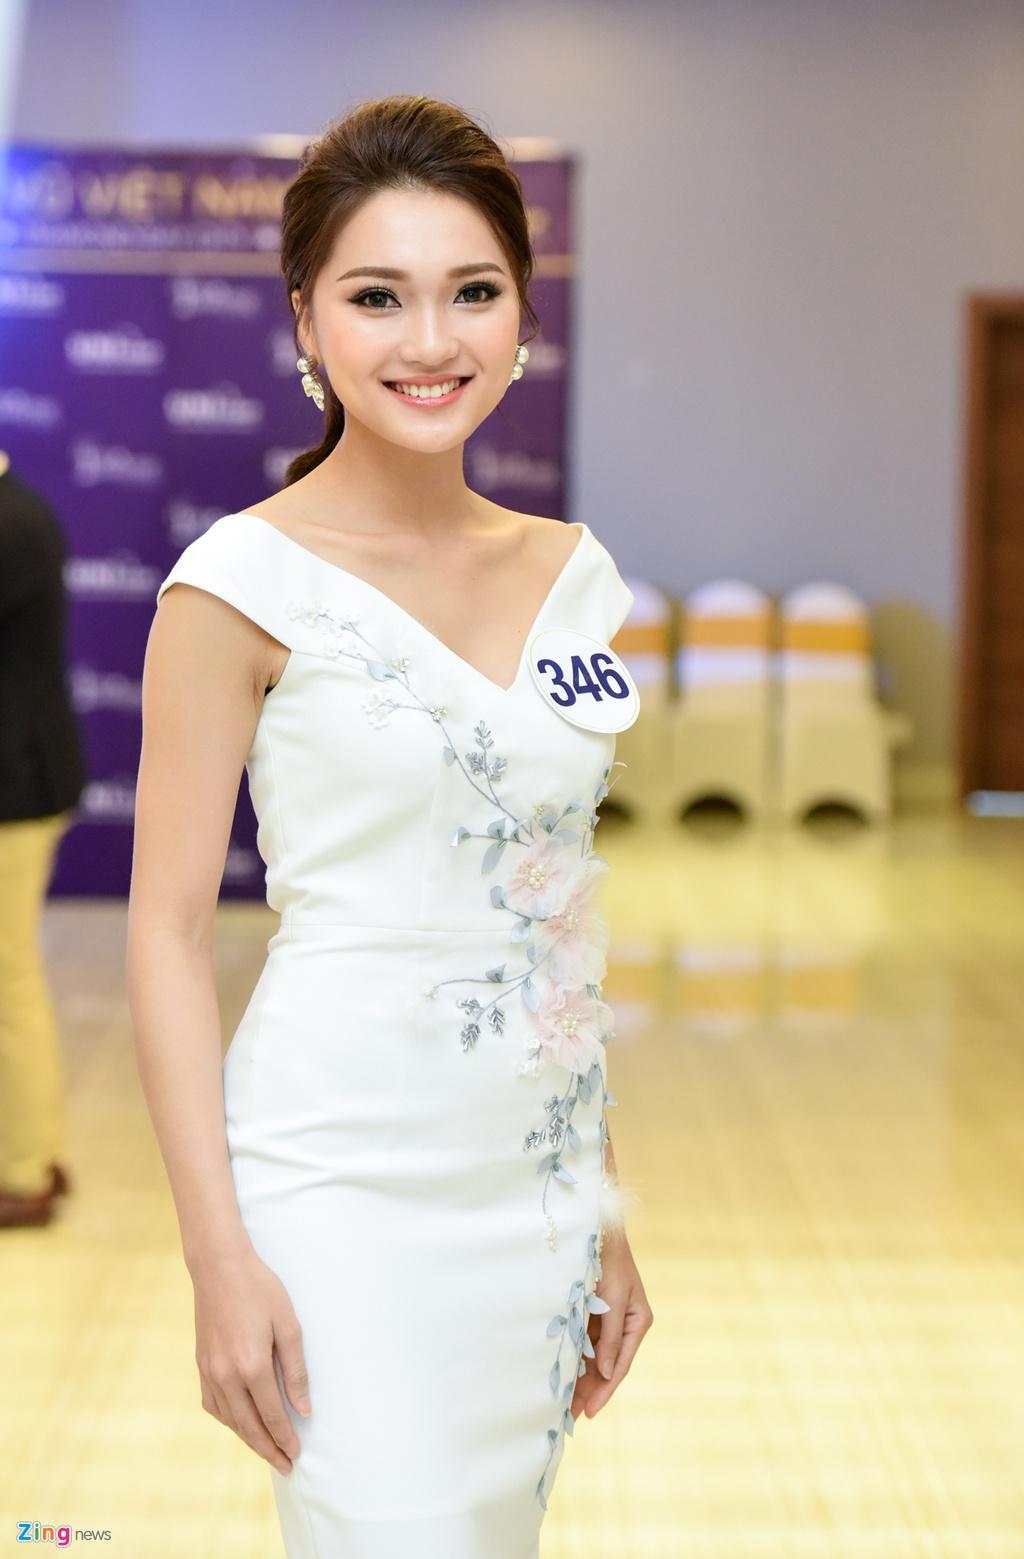 Nhan sac thi sinh Hoa hau Hoan vu Viet Nam truoc dem chung ket hinh anh 9